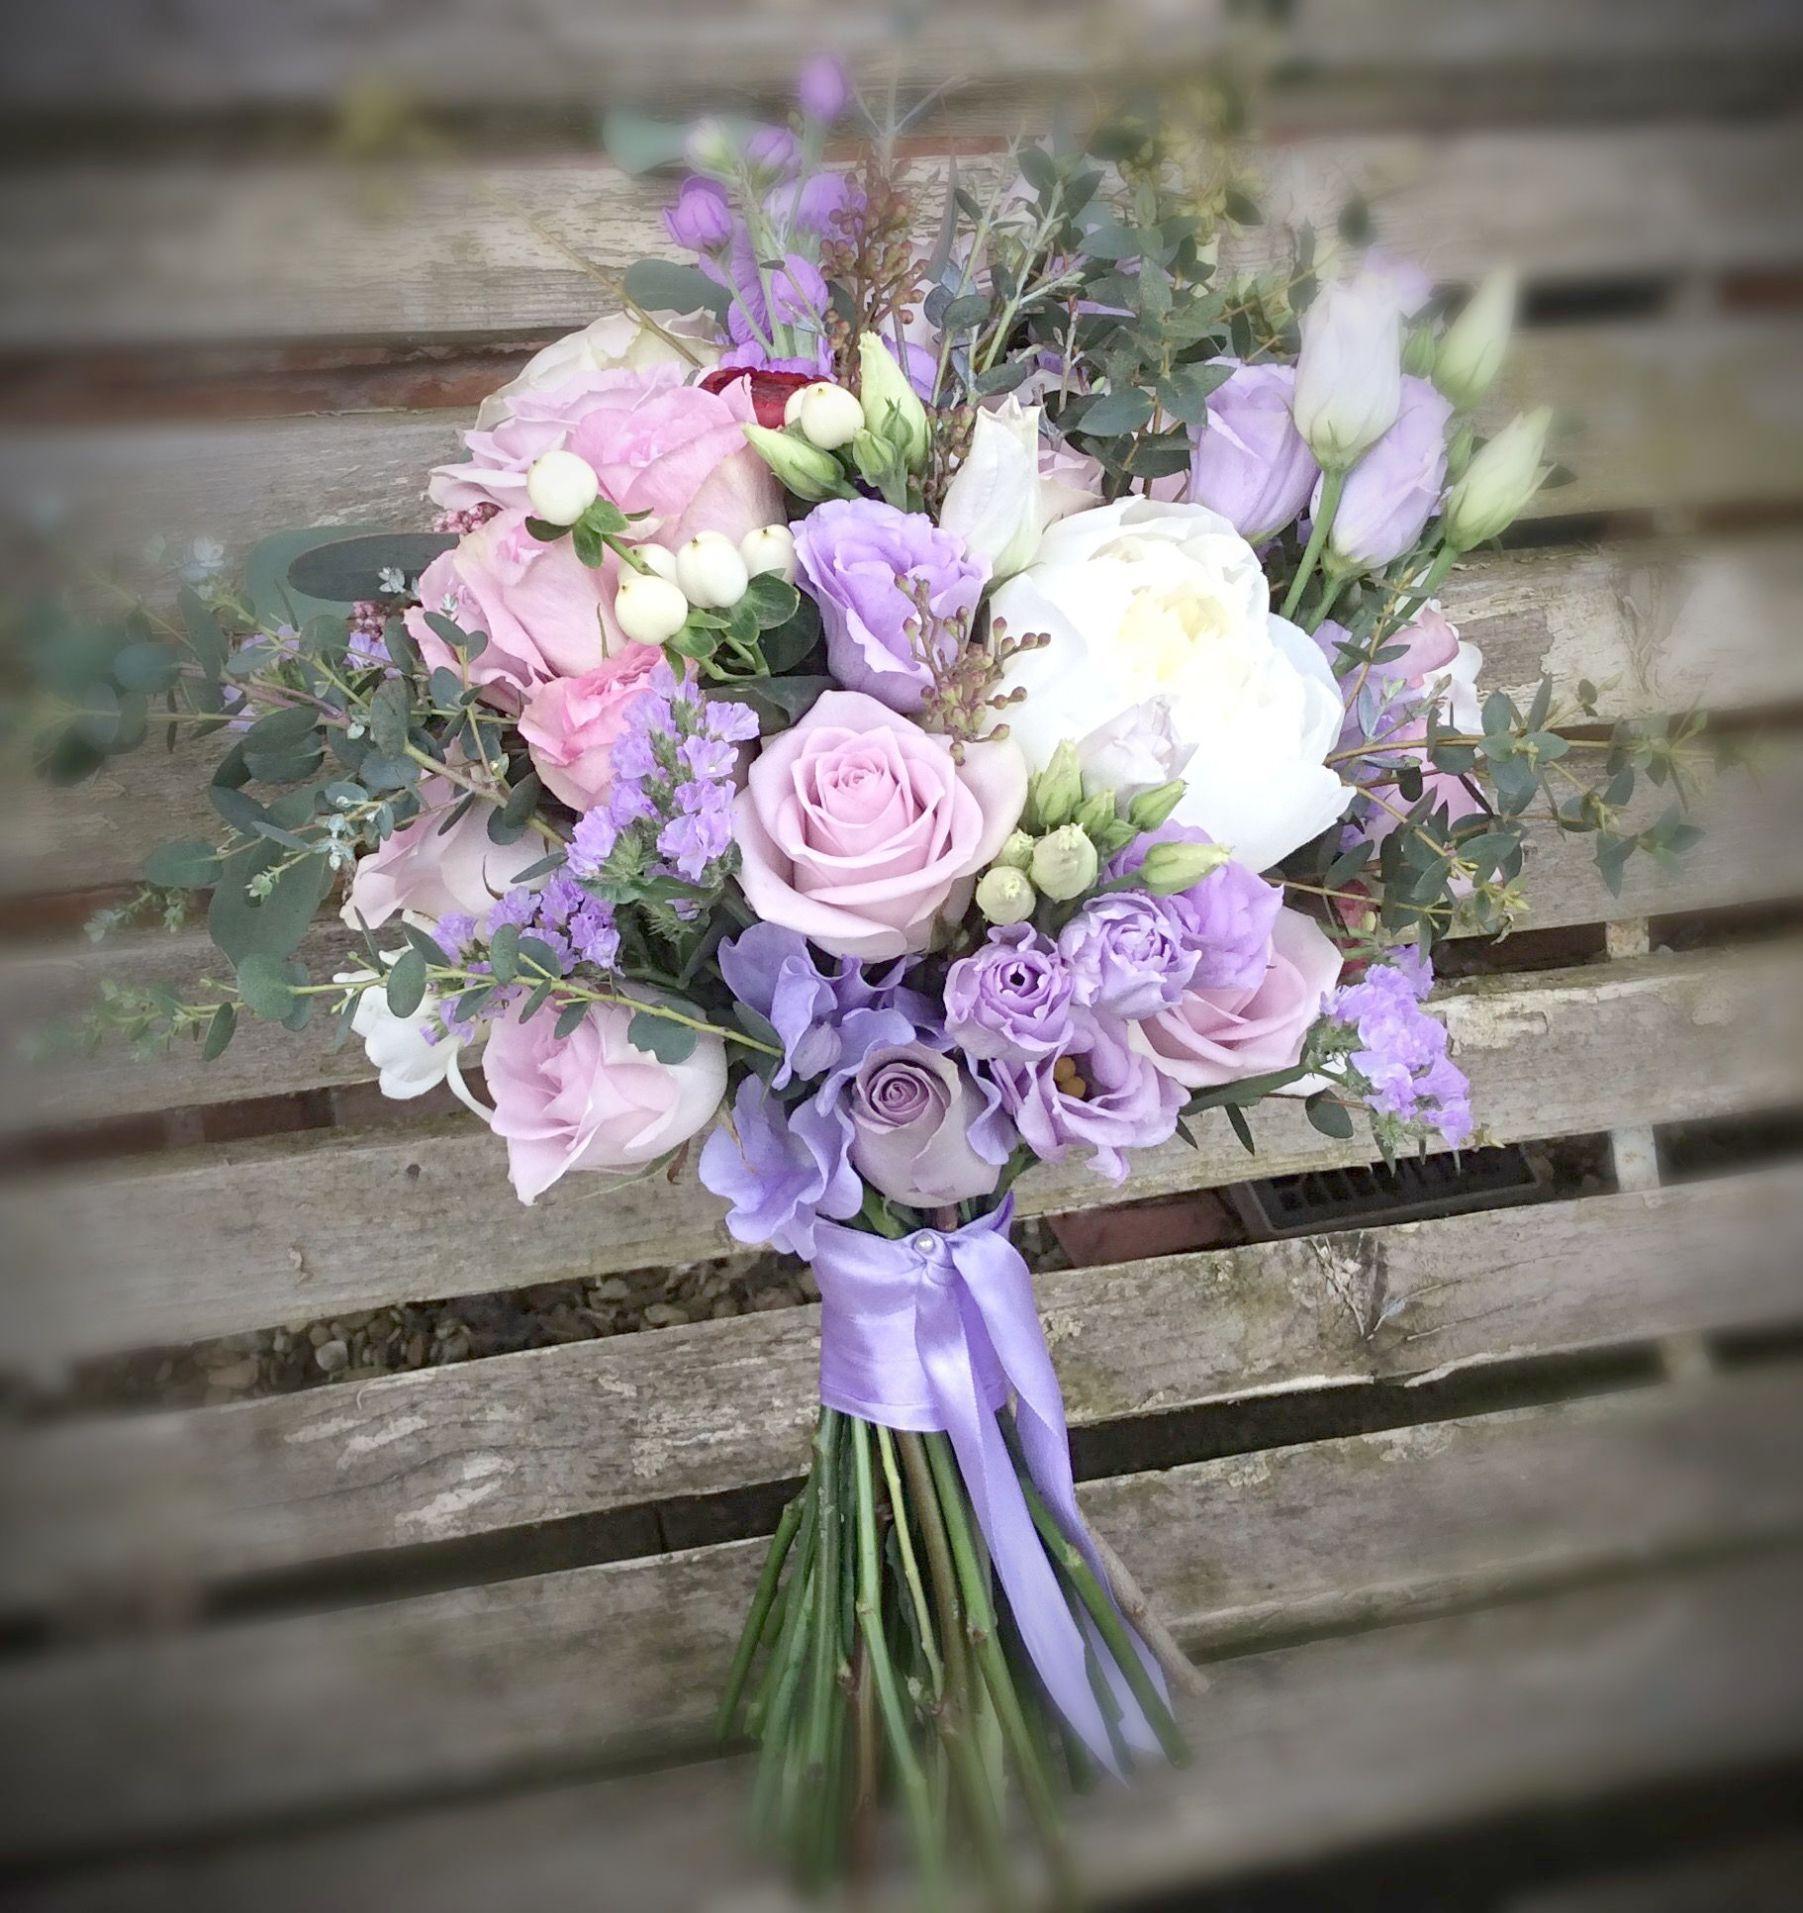 Wedding Flowers Preserved Real Freeze Dried Rose Petals True Red 2 4 Oz 56 Grams 200 Petals Flower Bouquet Wedding Purple Wedding Bouquets Wedding Flower Guide